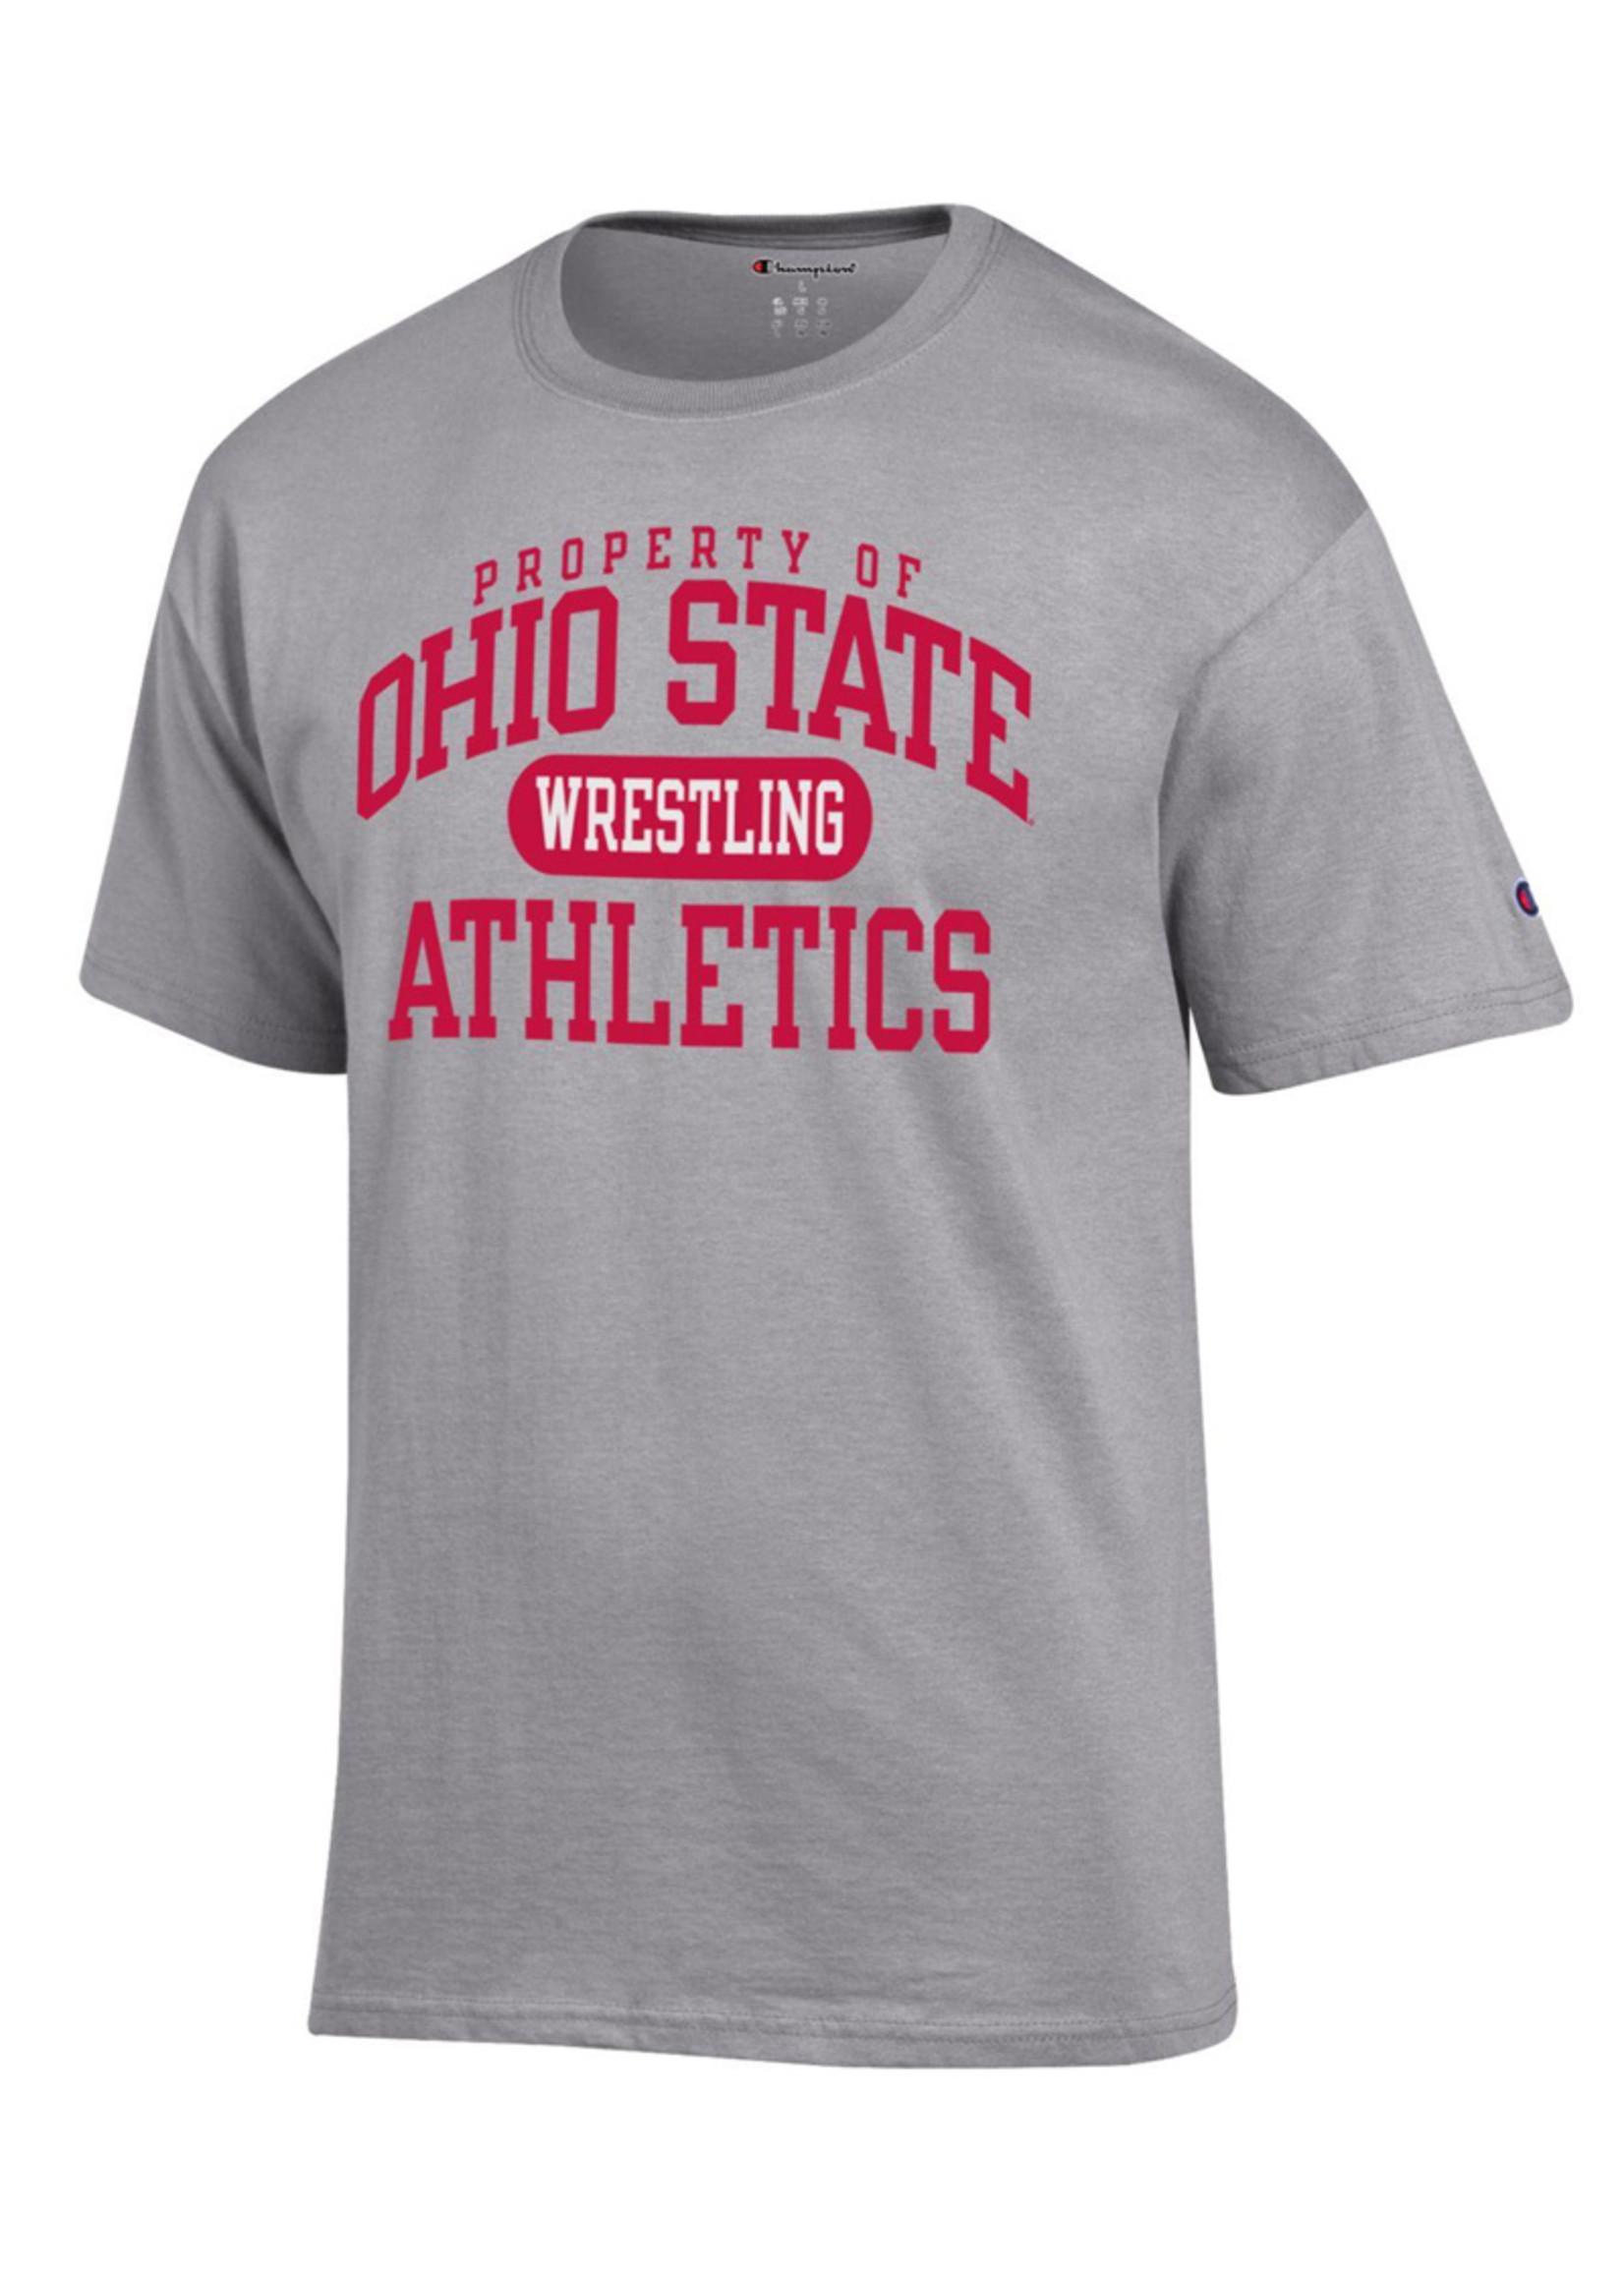 Champion Ohio State University Property of Wrestling Tee